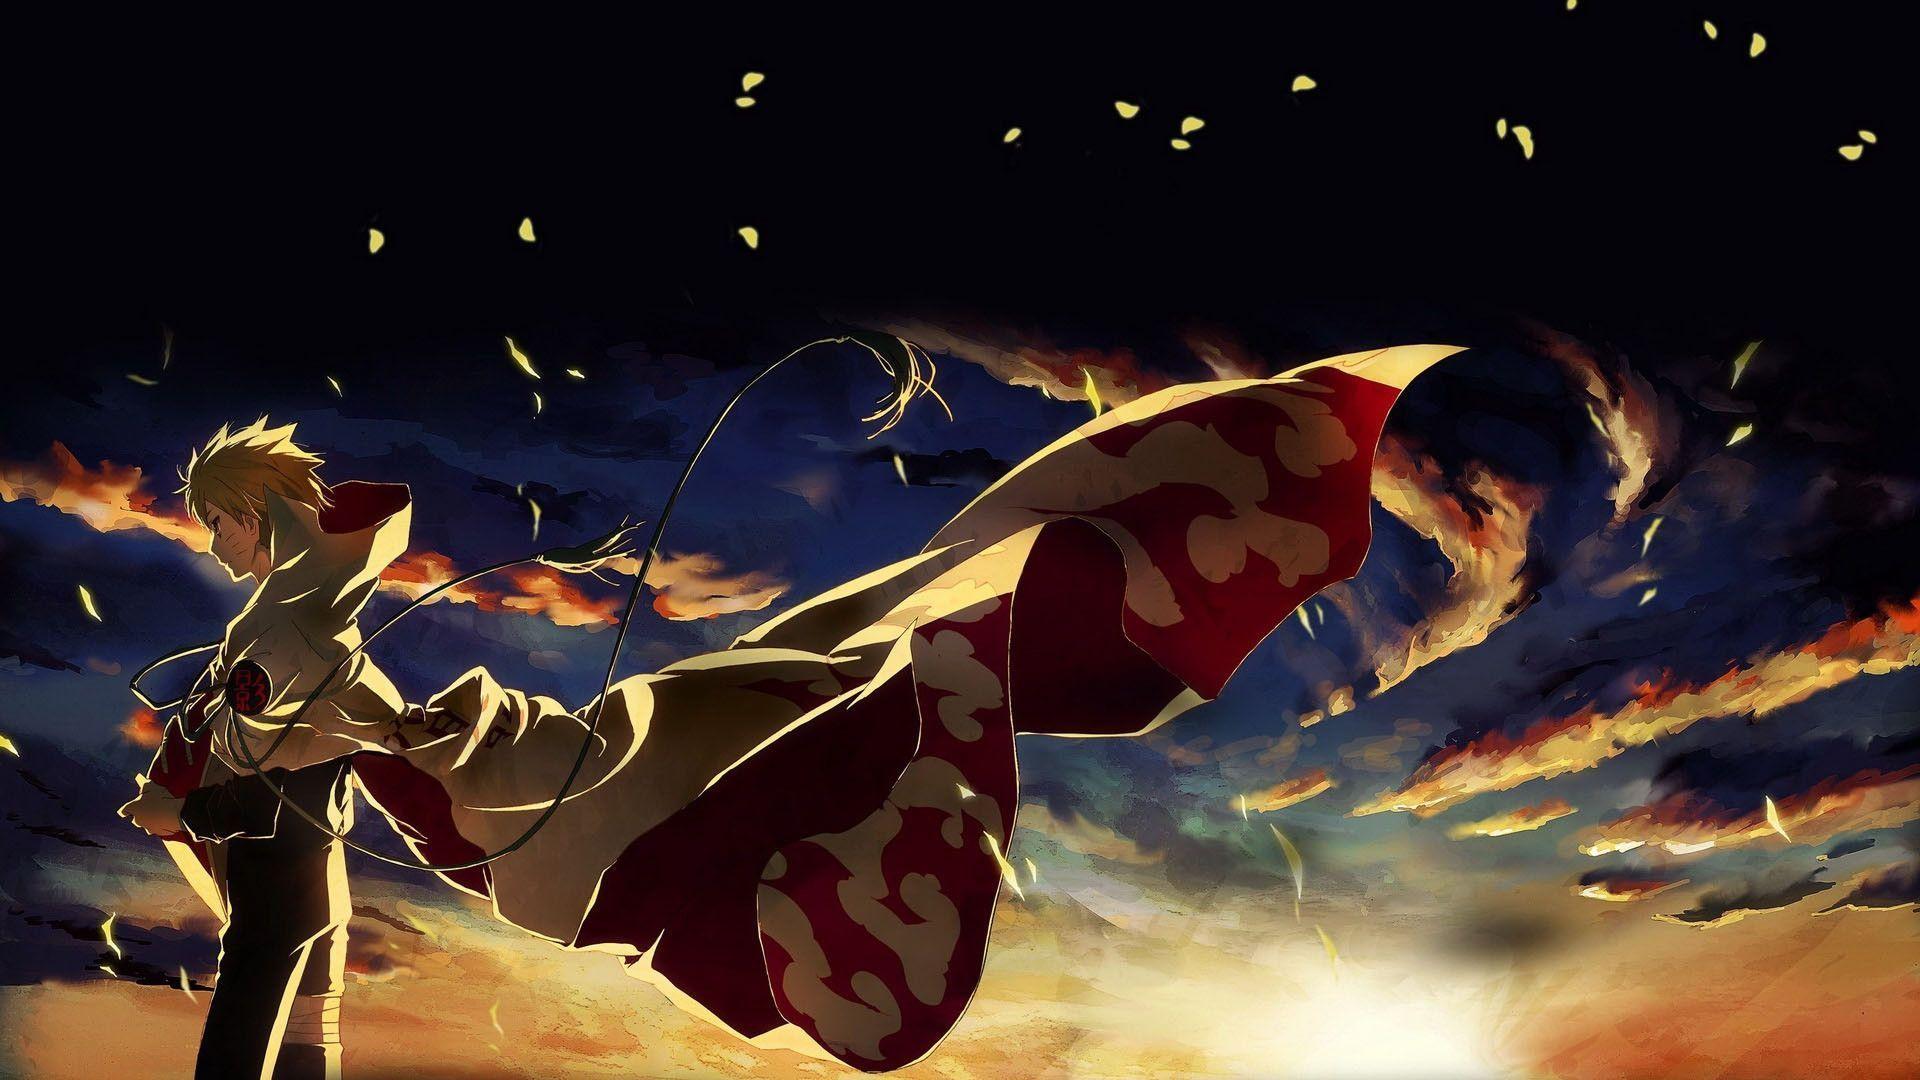 Beautiful Wallpaper Naruto Cute - 9c355c66a7618669b5af690283426f94  Pic_375741.jpg